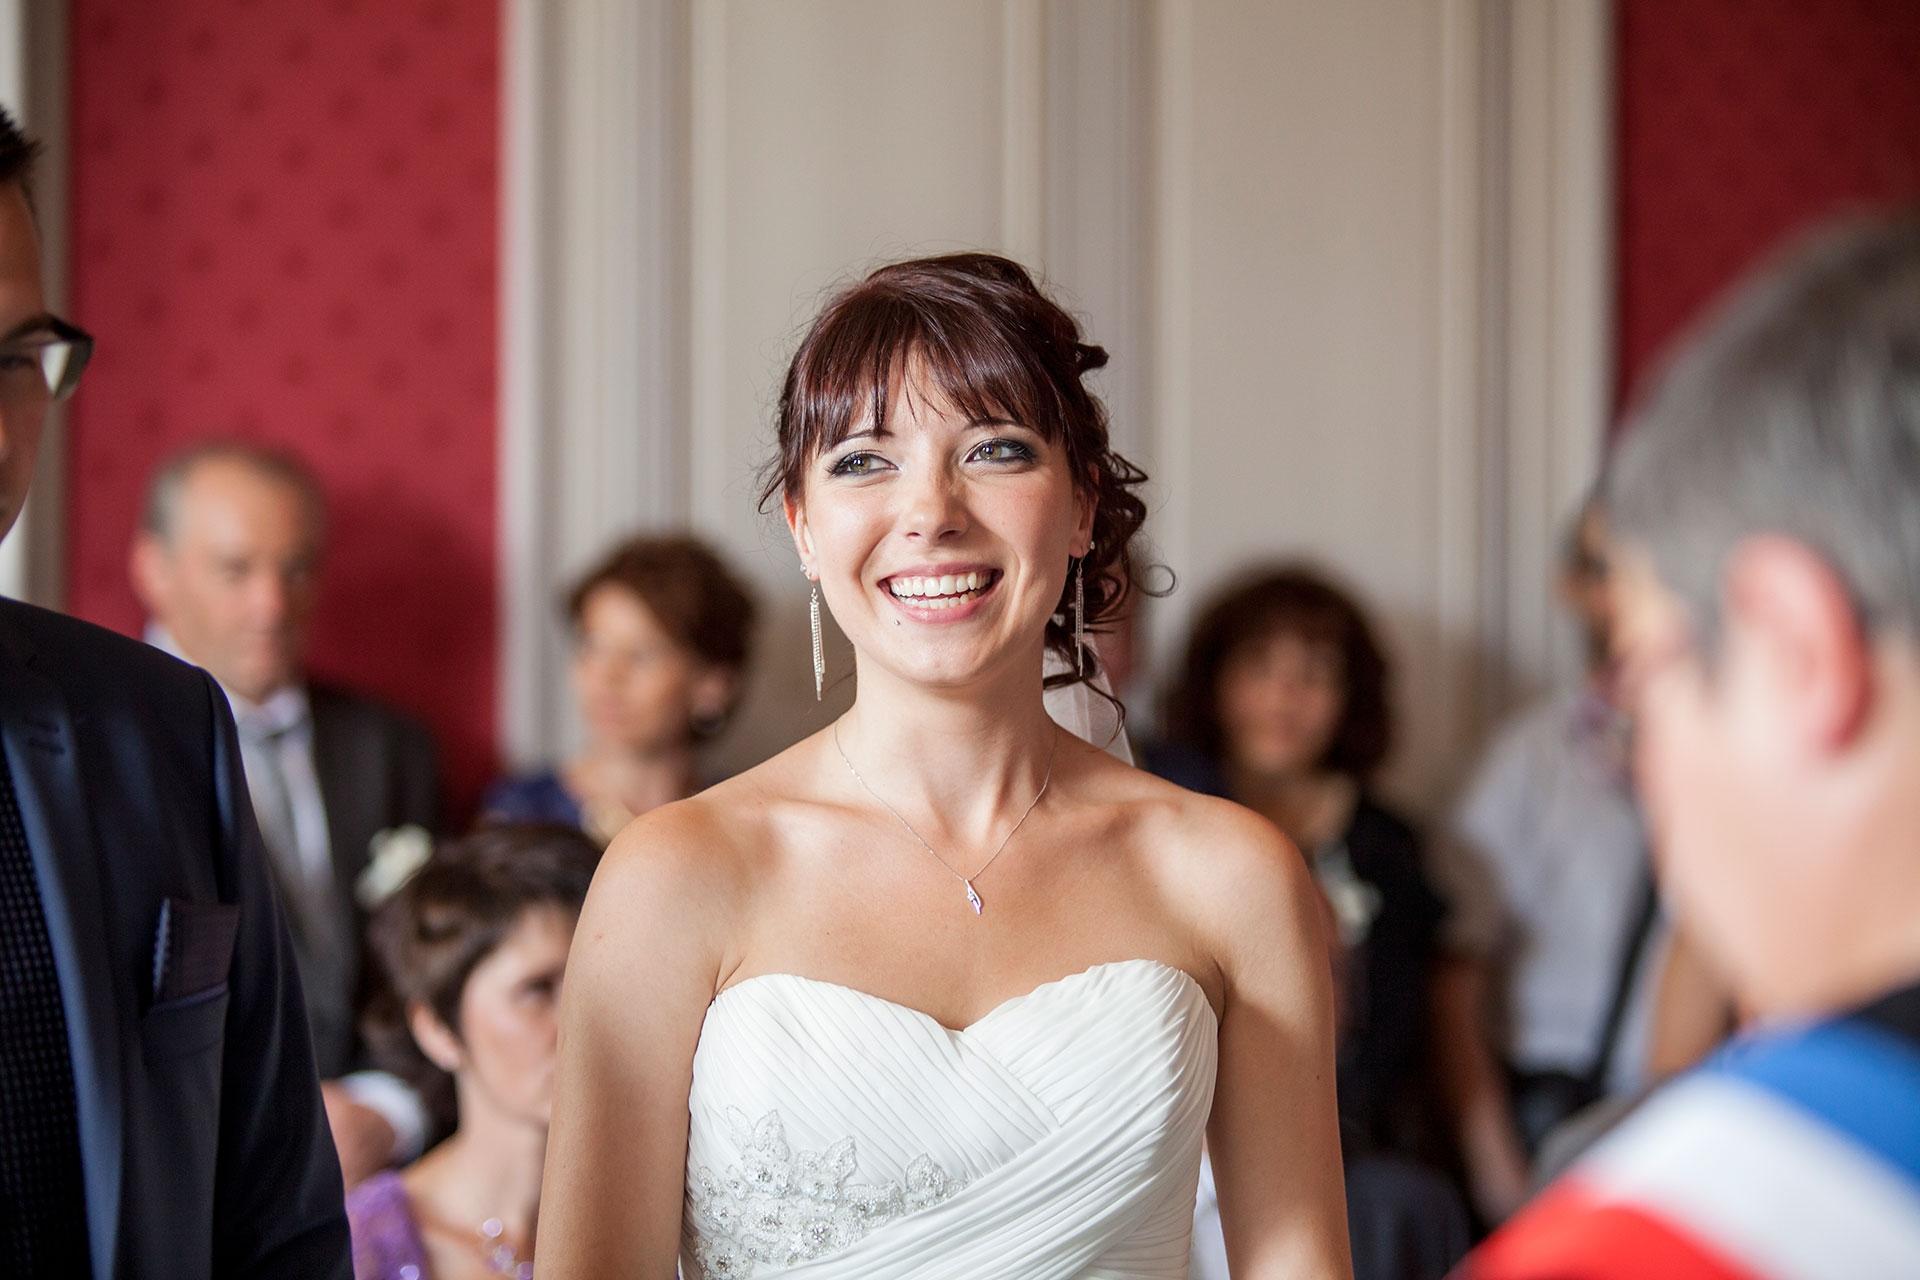 particuliers-evenements-mariages-oui-aurelie&geoffrey-02